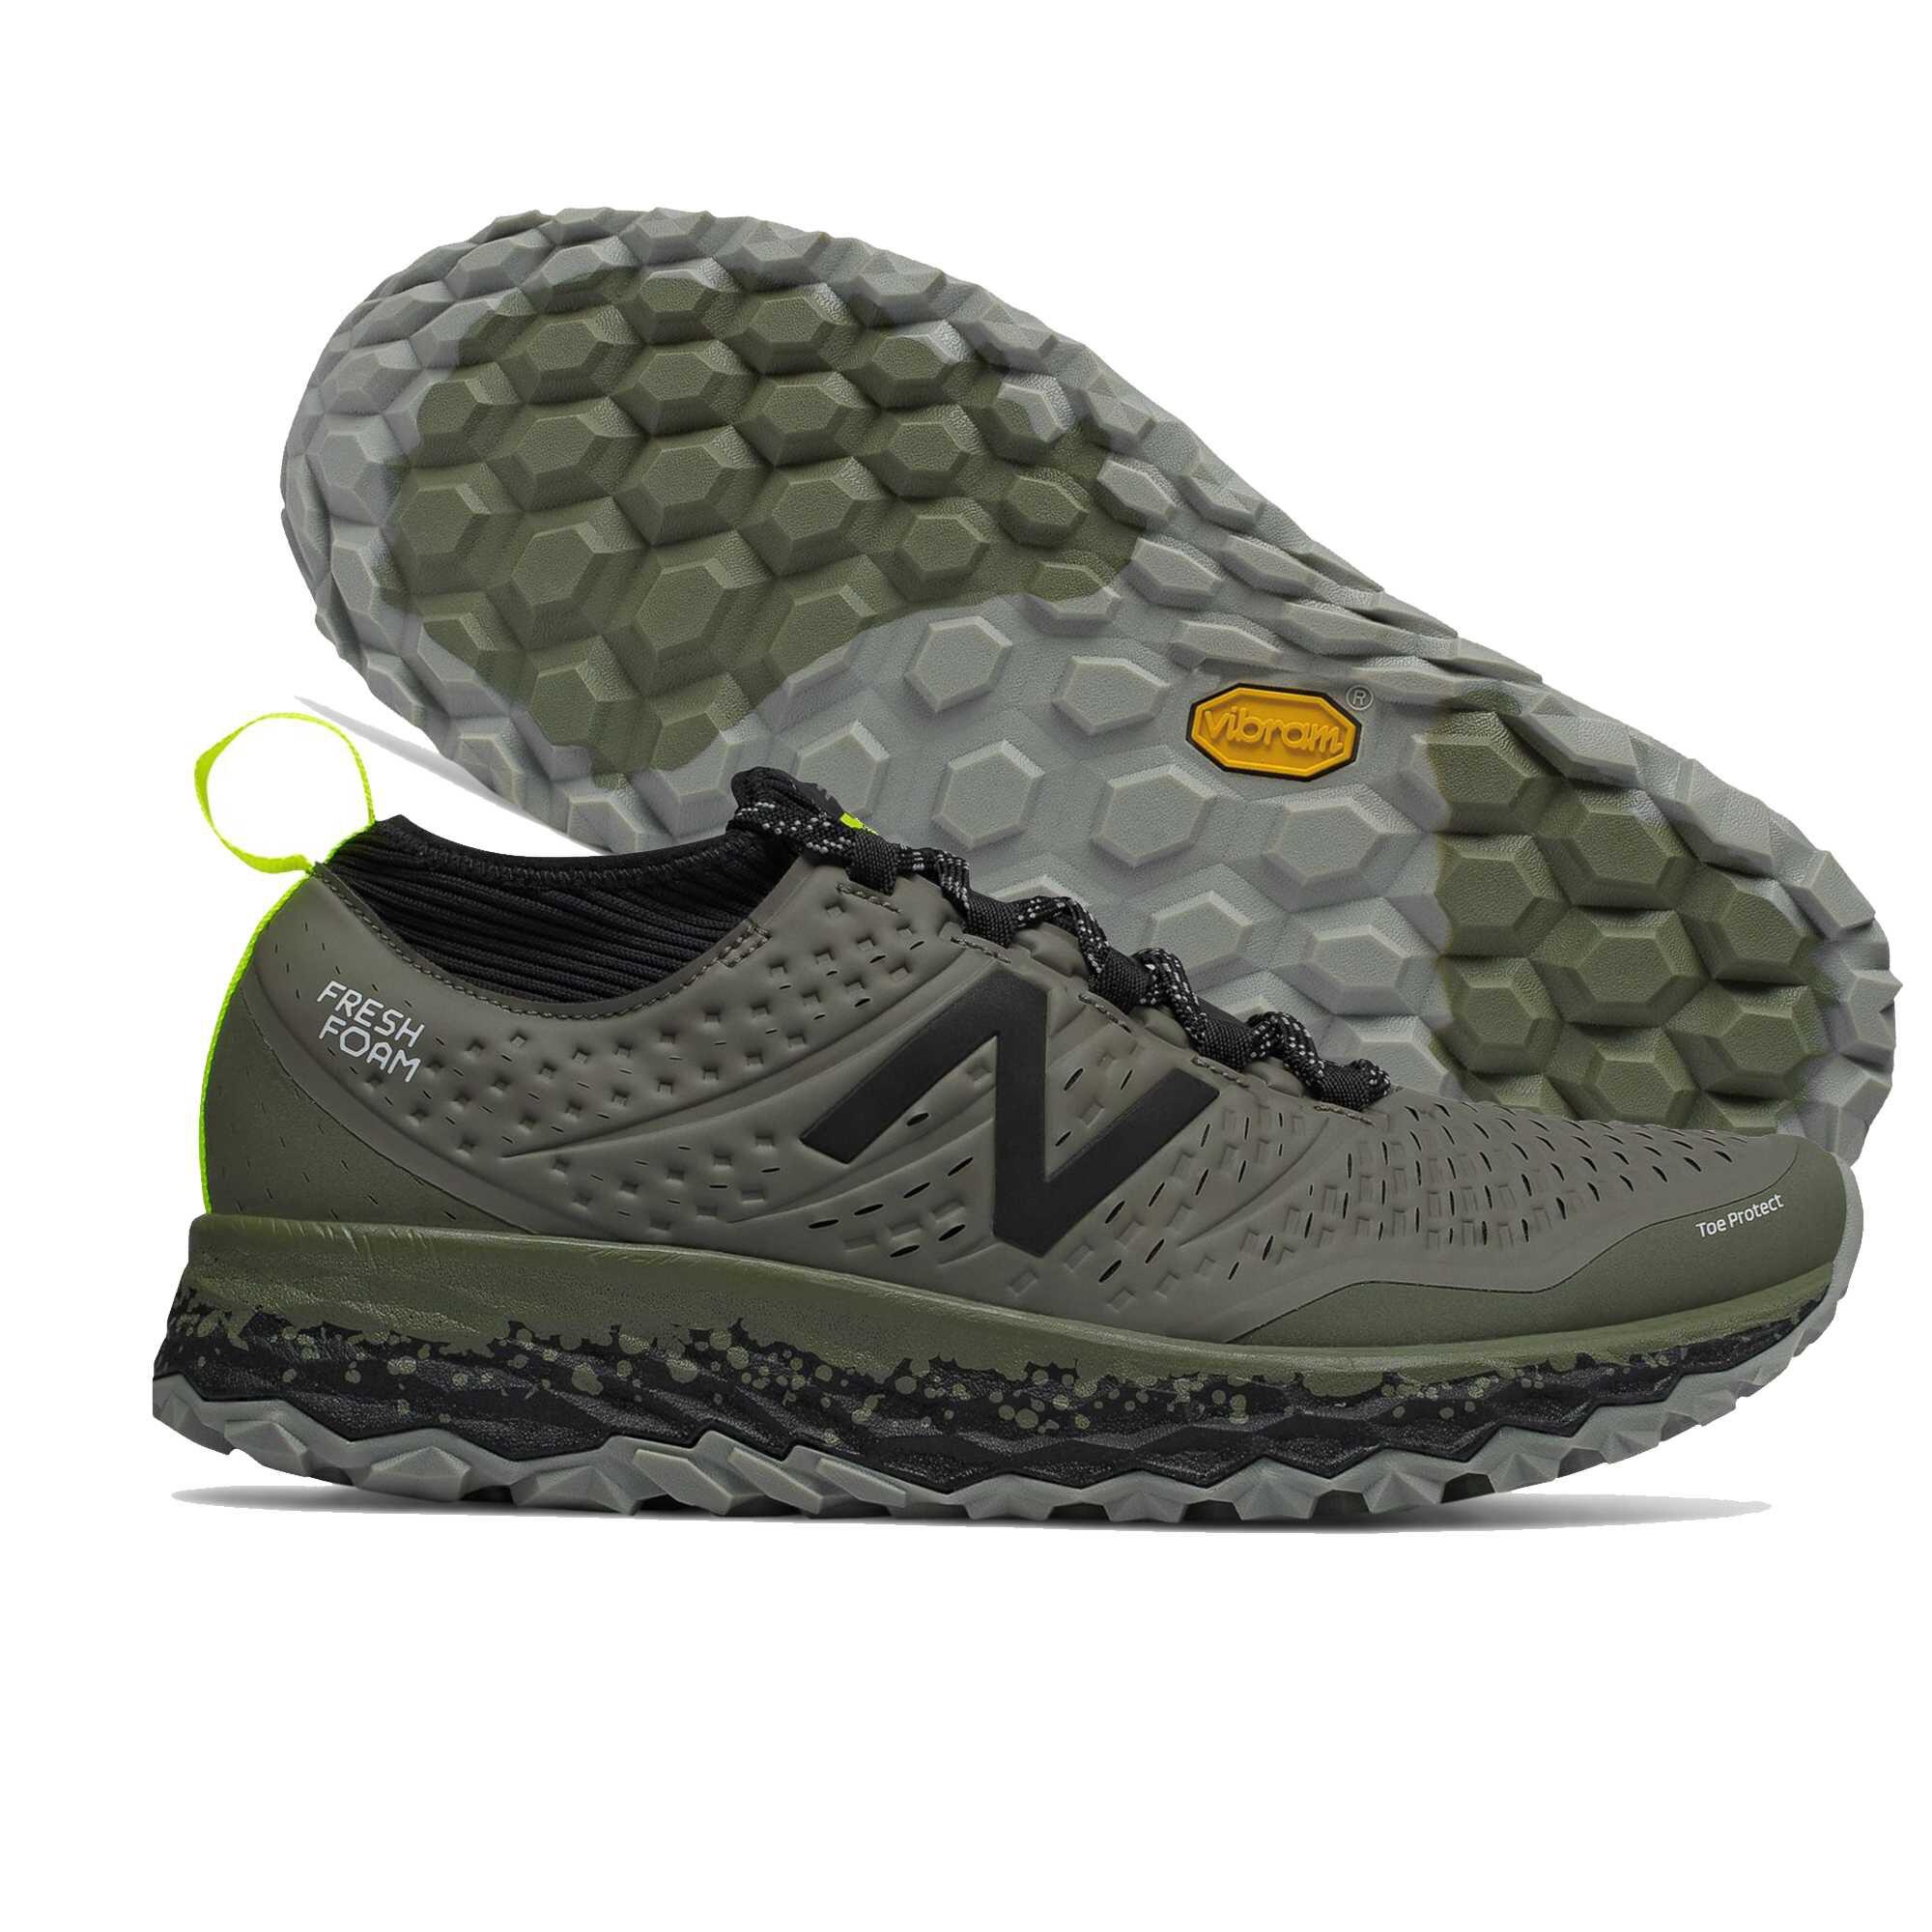 3bfa0db59fe2 2018 Hierro Fresh Trail V3 Foam Balance New Running w5tvzqXvS